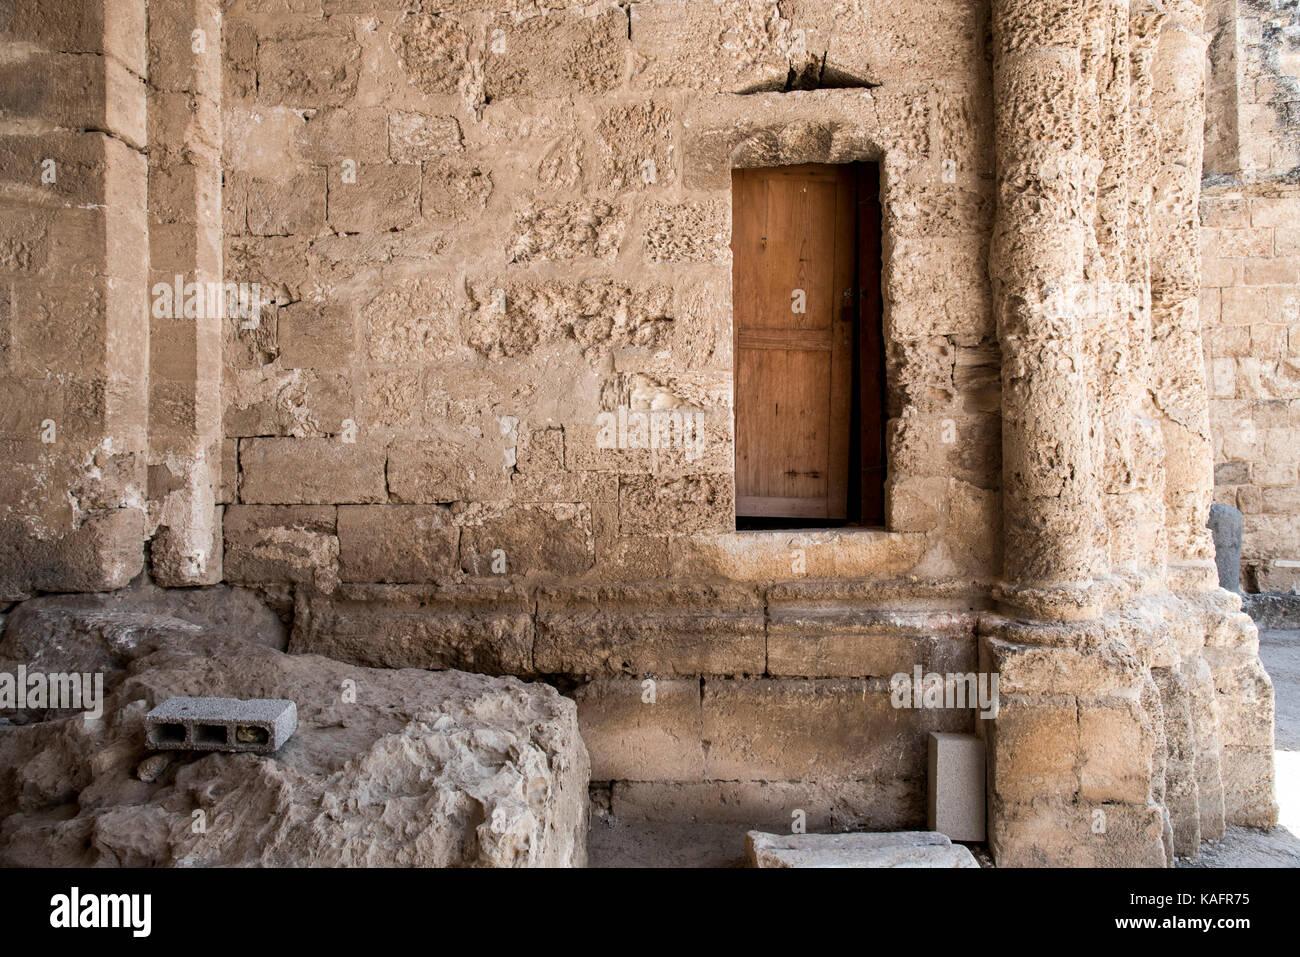 the Crusader Church of St. Anne in Zippori (Sepphoris), Lower Galilee, Israel Stock Photo